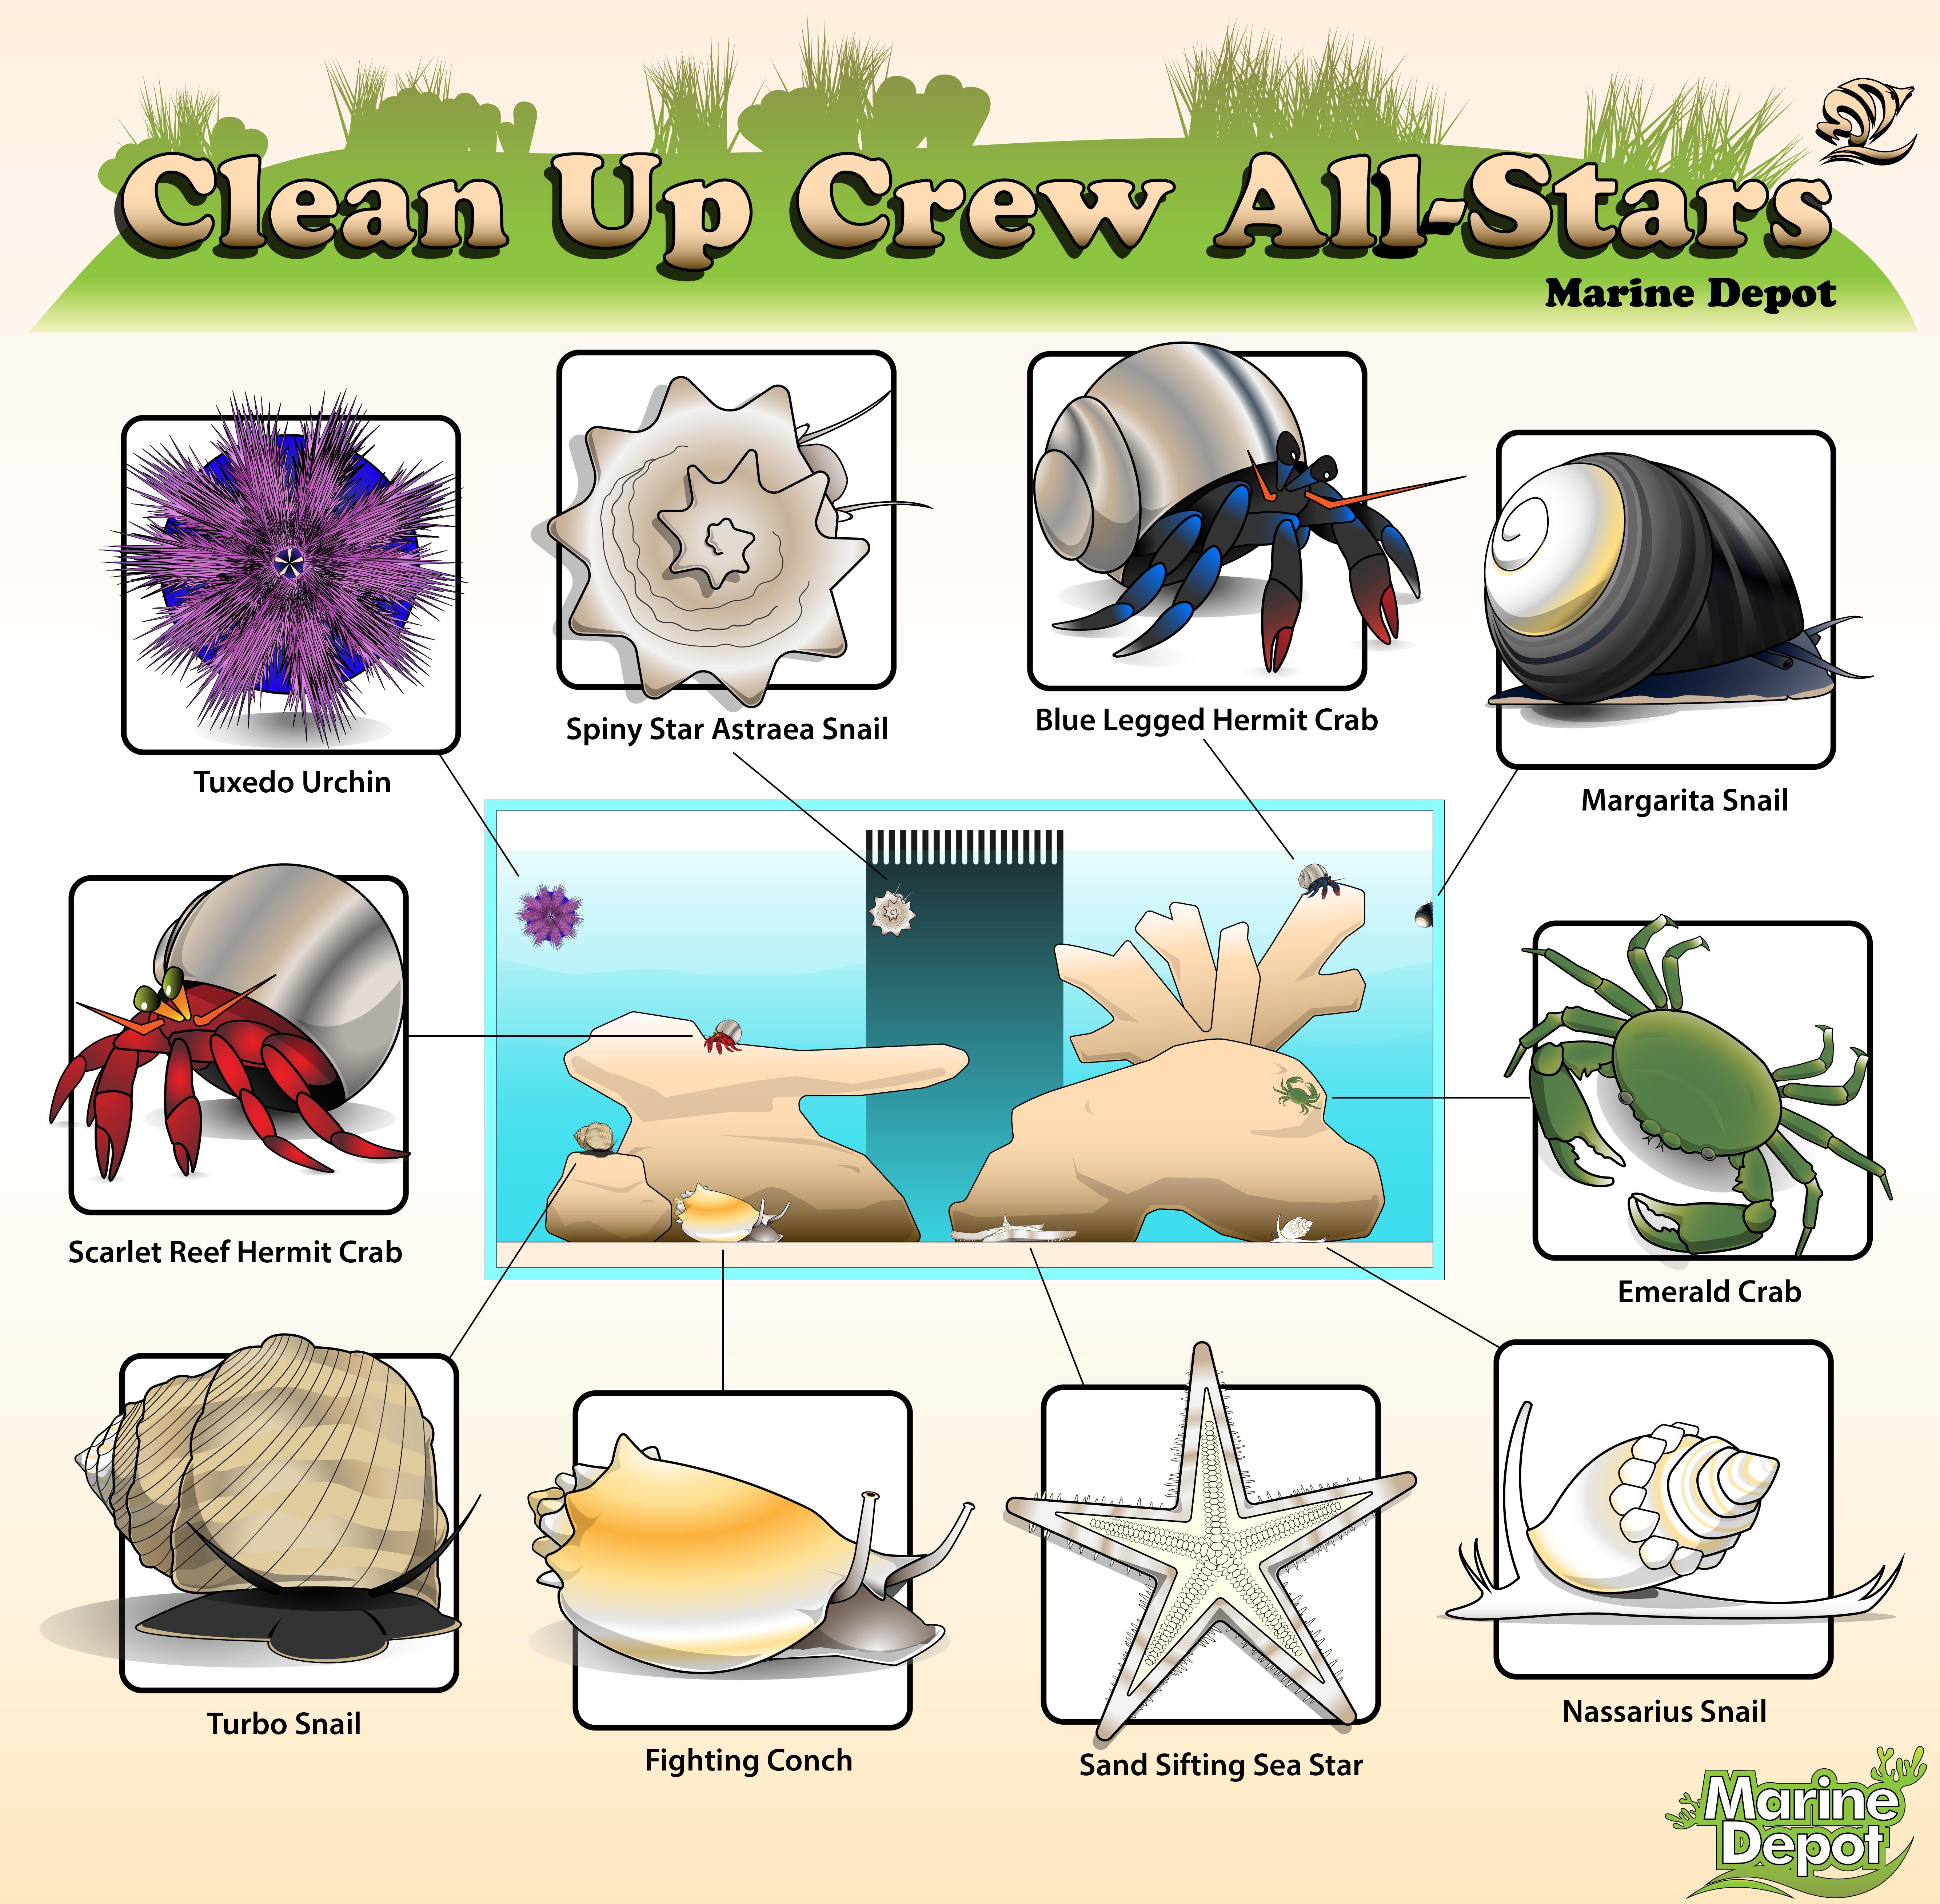 Cleanup Crew Allstars Part 1: Invertebrates